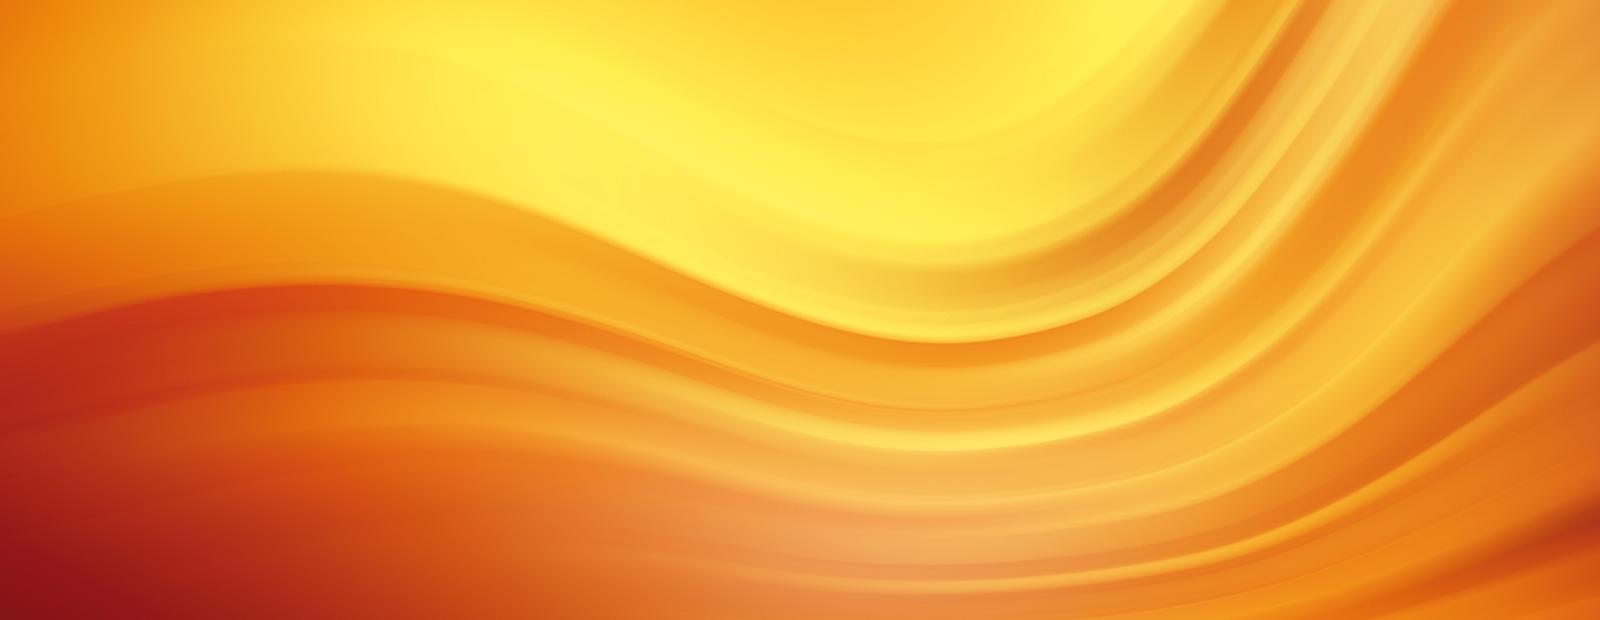 Fomblin-Lubricants-abstract